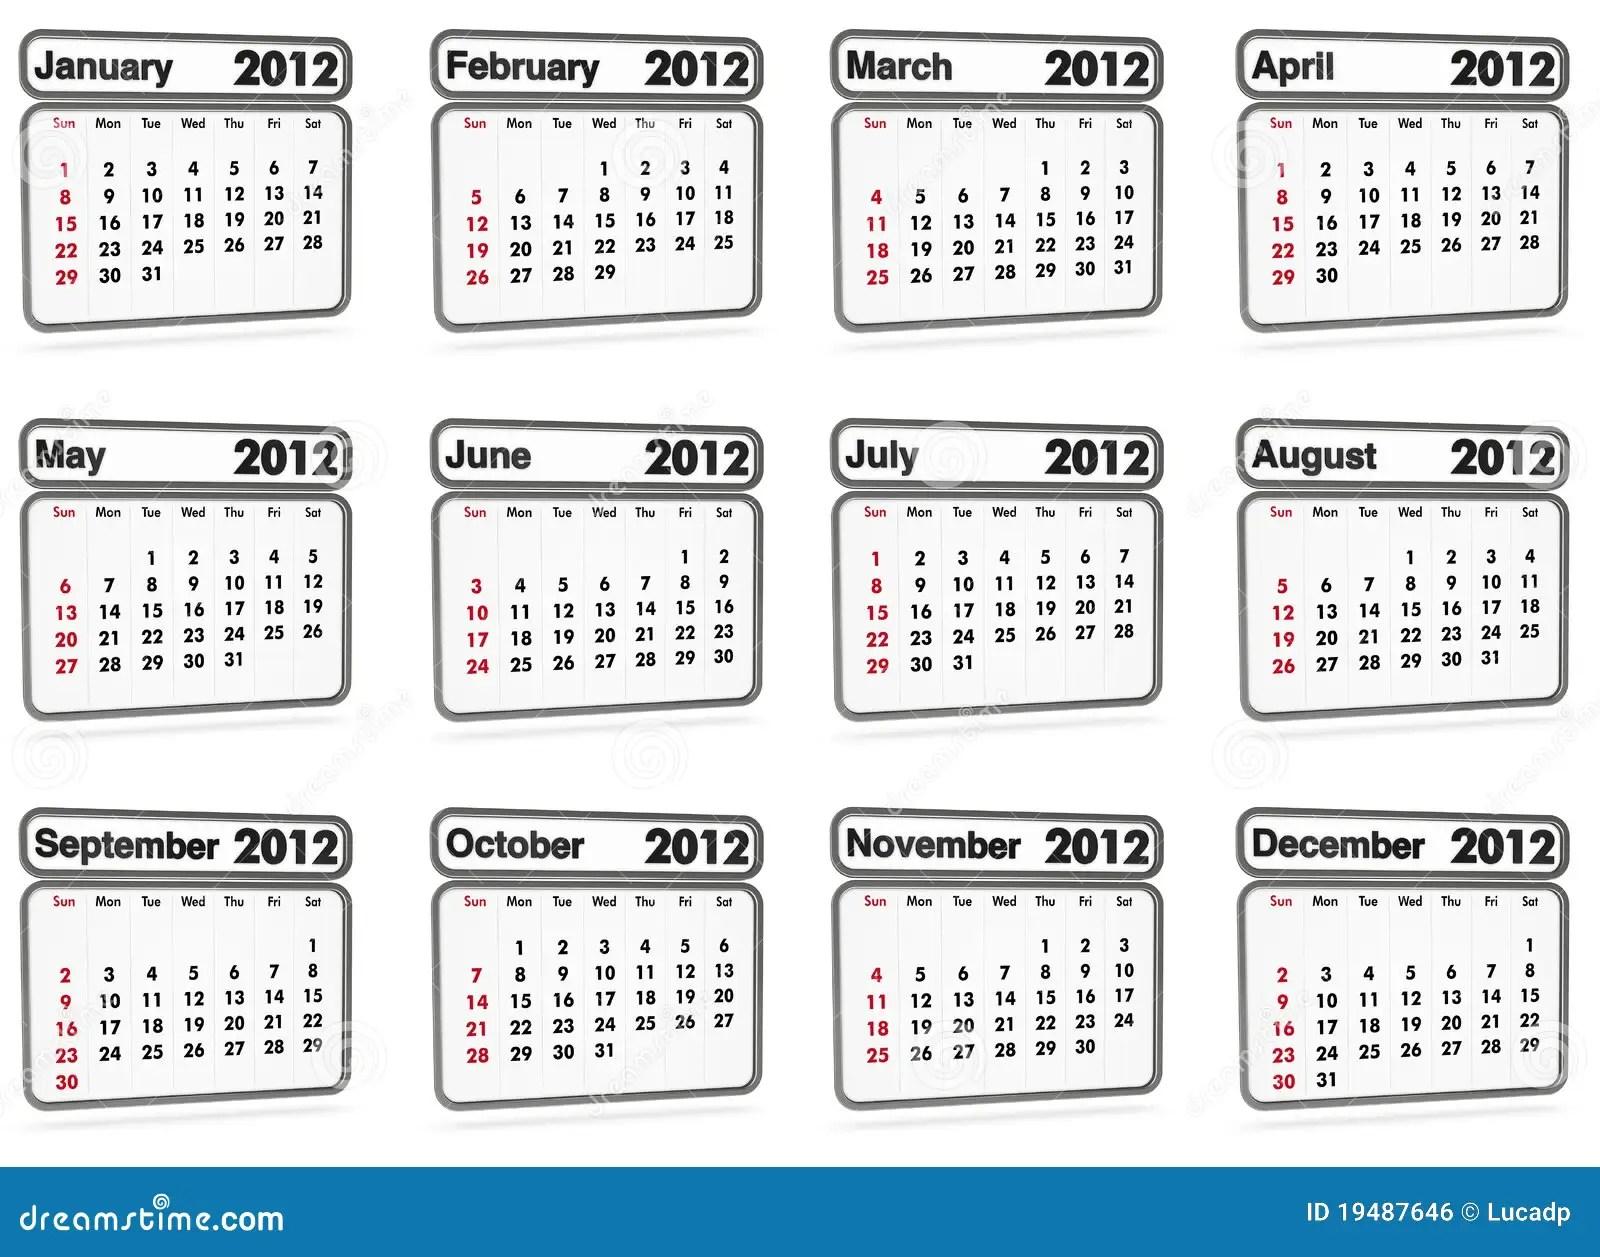 Free Calendar Print September 2012 Year 2012 Calendar Time And Date Calendar 2012 All Months Royalty Free Stock Image